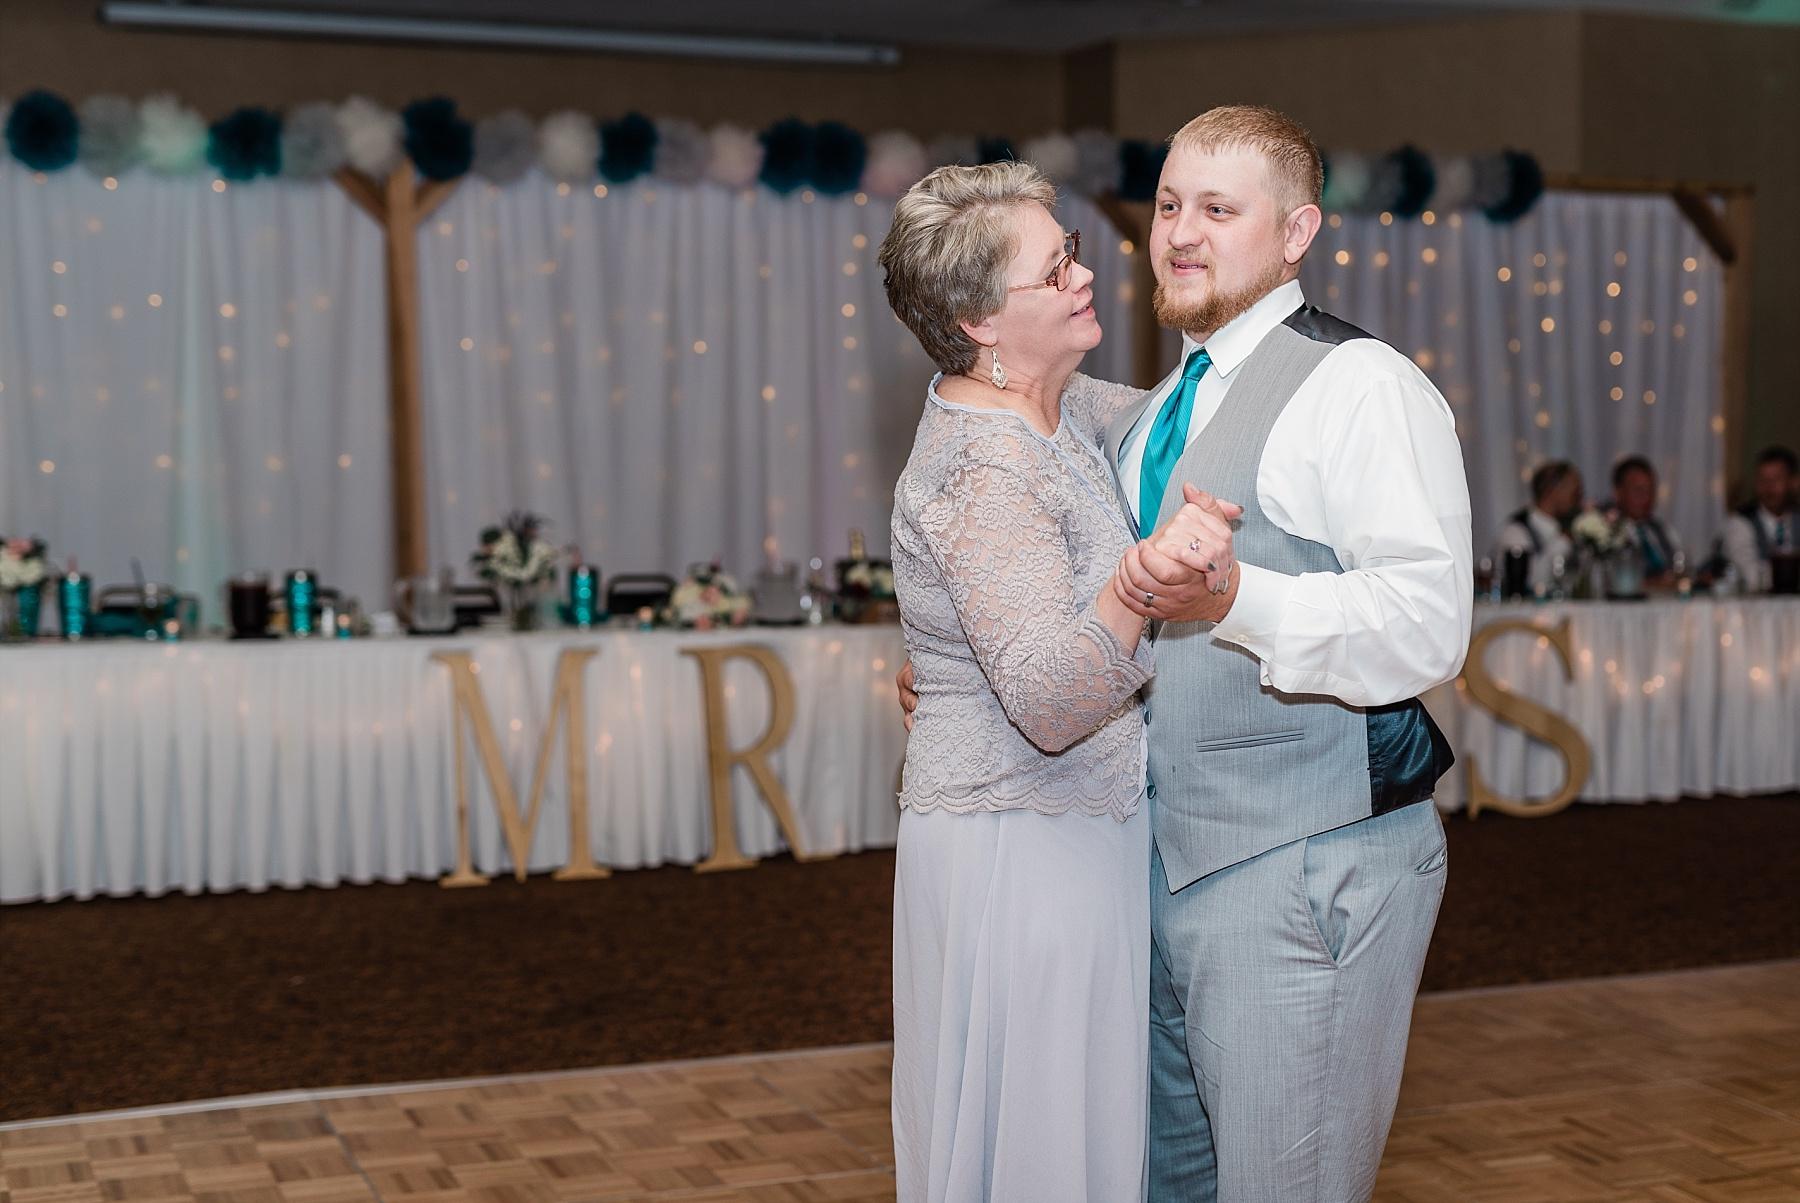 Baurichter Wedding at Stoney Creek Inn Columbia Missouri by Kelsi Kliethermes Photography_0029.jpg